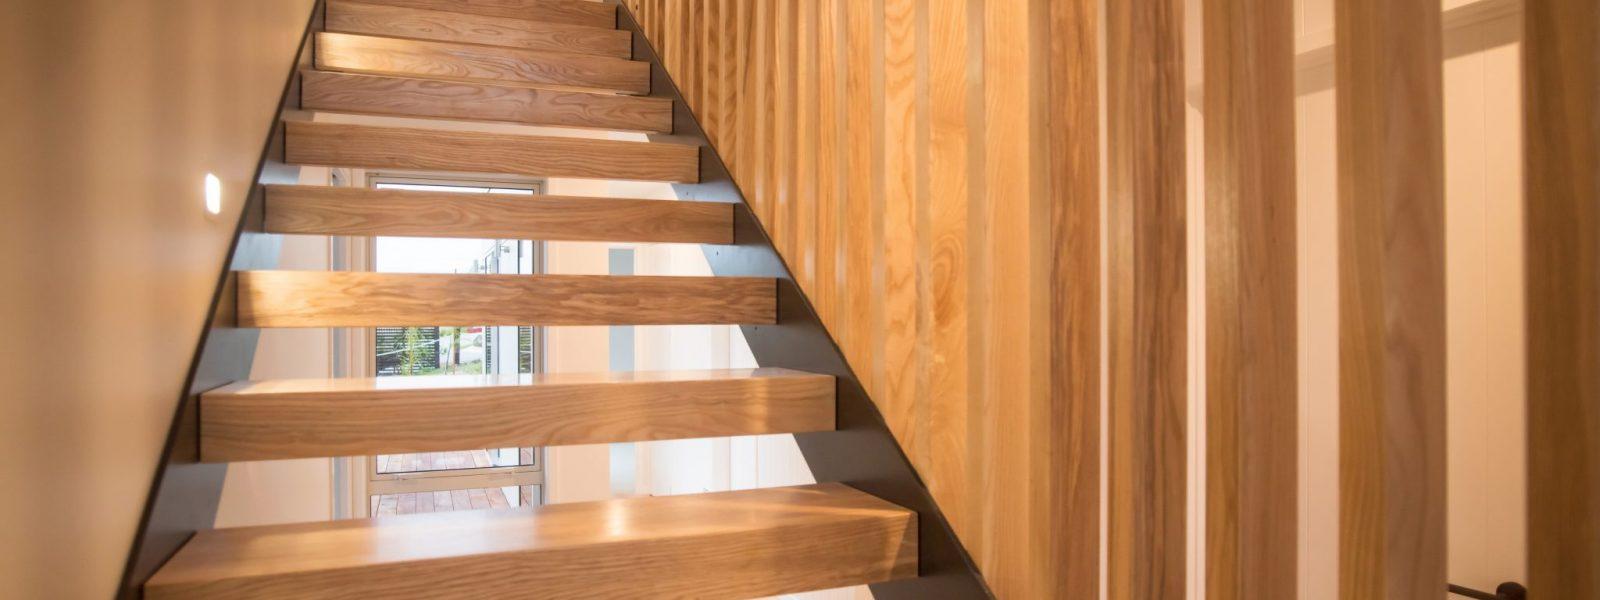 Stairs - Header Image